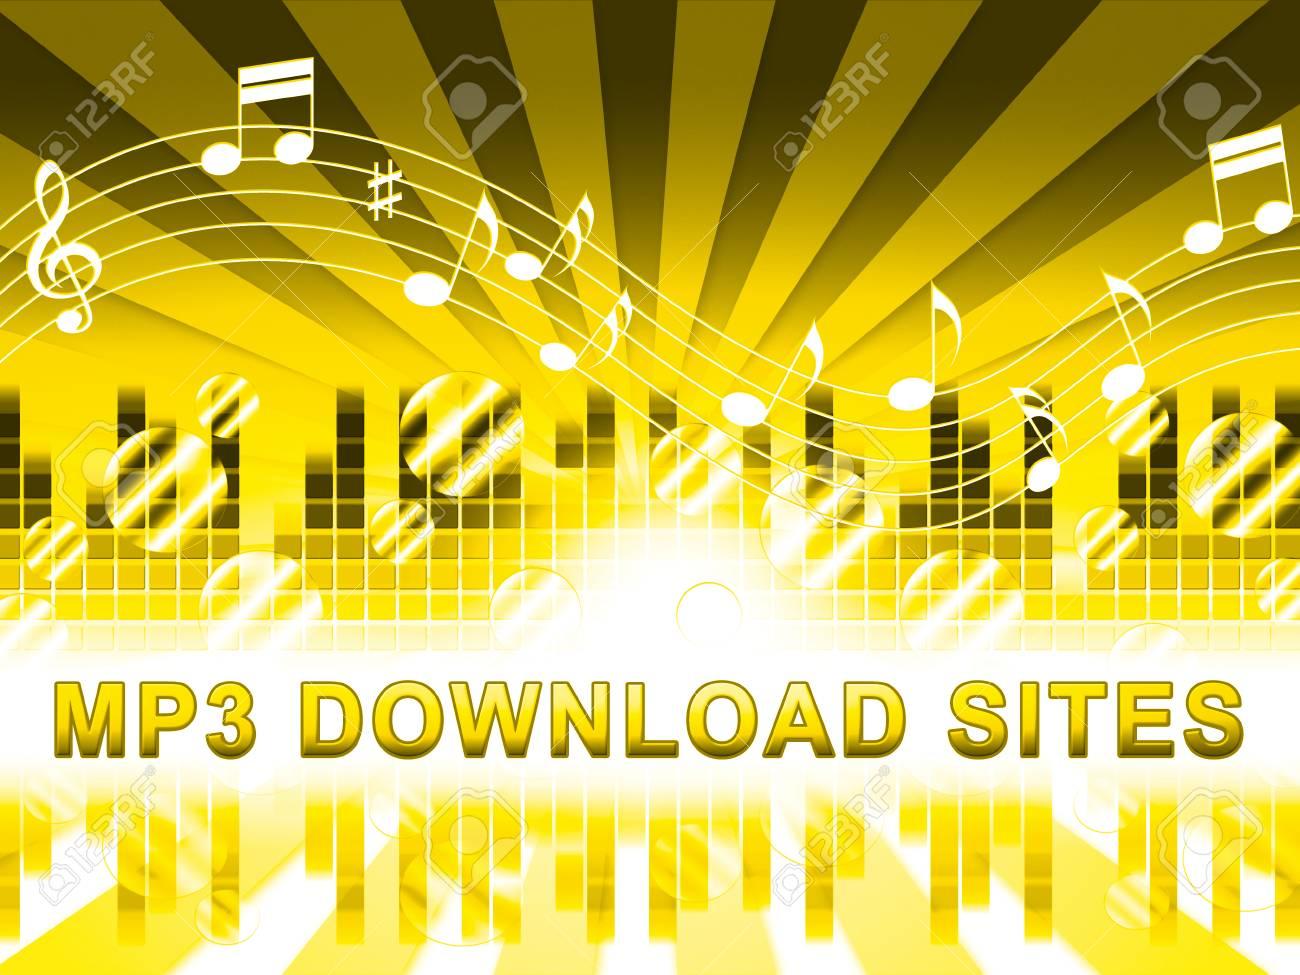 Mp3 Download Sites Design Means Music Downloads Website